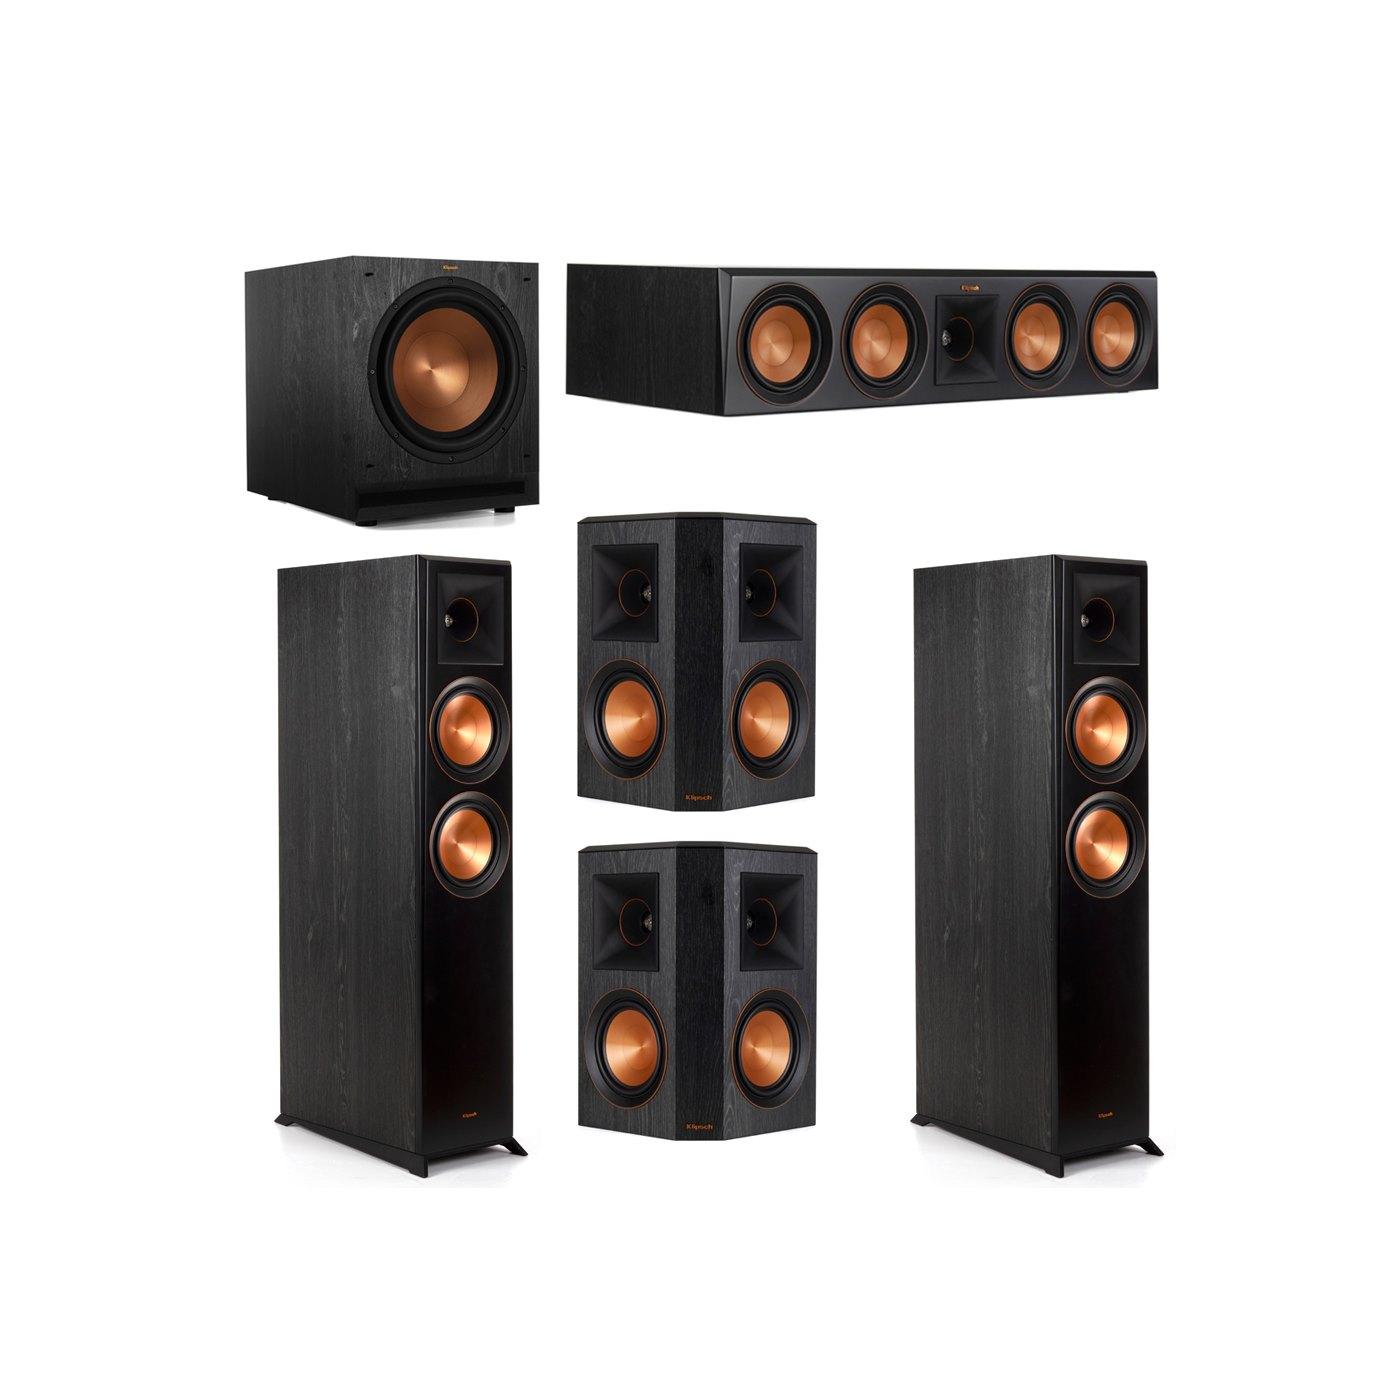 Klipsch 5.1 System with 2 RP-6000F Floorstanding Speakers, 1 Klipsch RP-504C Center Speaker, 2 Klipsch RP-502S Surround Speakers, 1 Klipsch SPL-120 Subwoofer